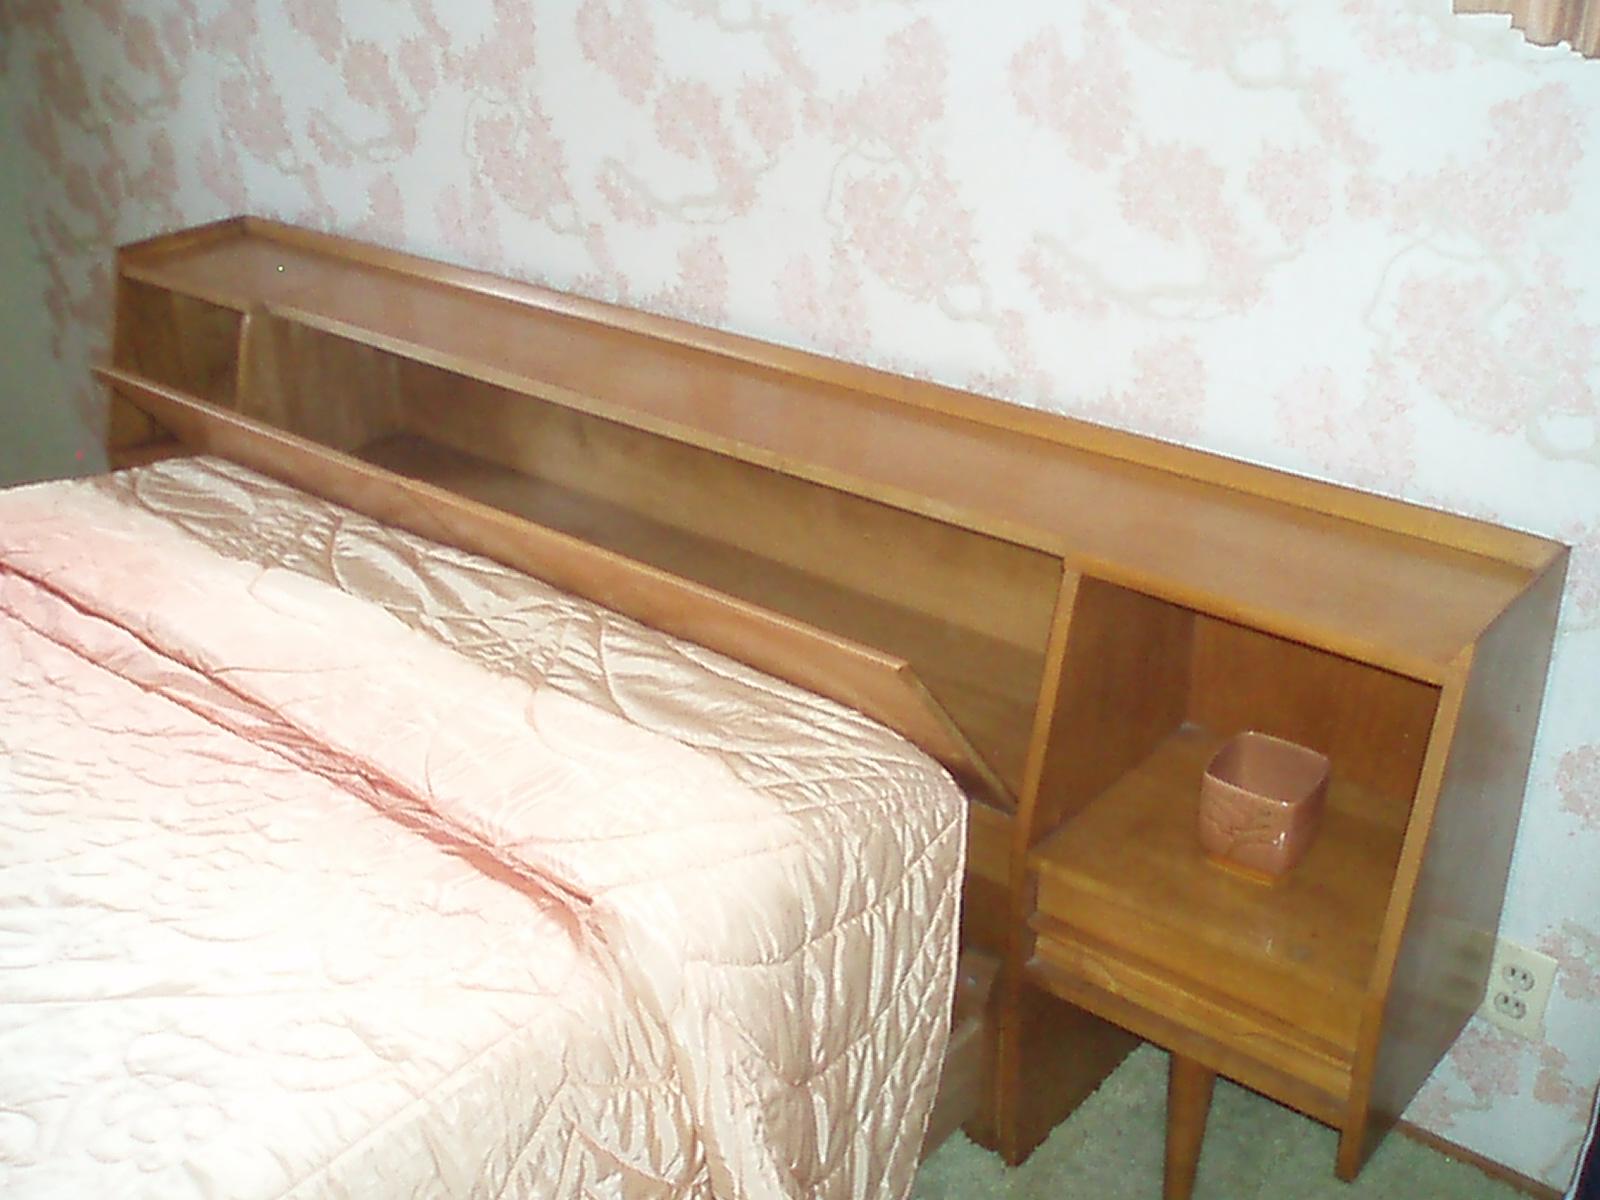 Bedroom Furniture 1950 S crawford of jamestown 1950's full bedroom set antique appraisal